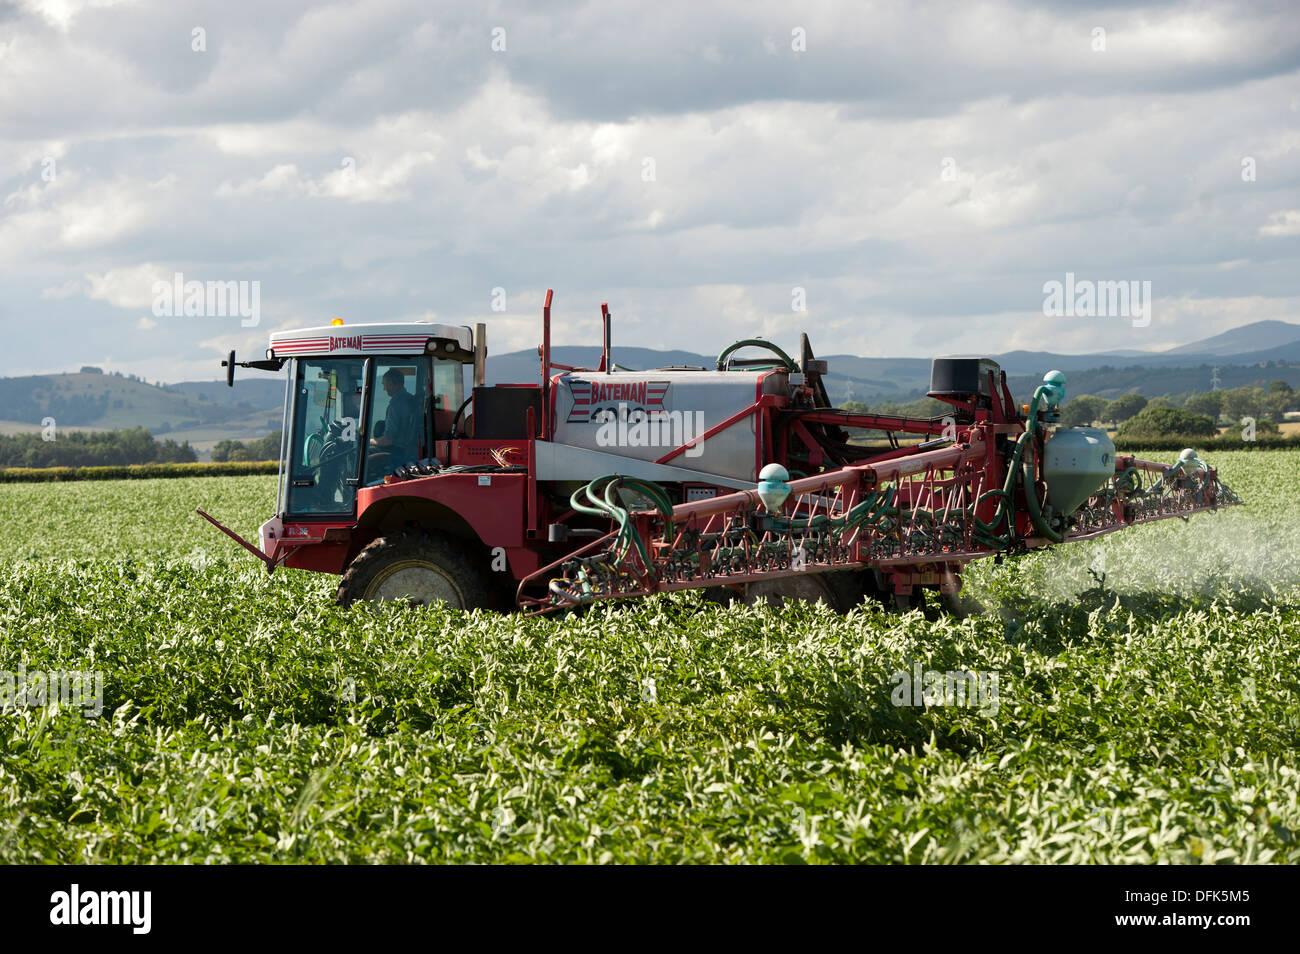 Spraying potoato crop with self propelled sprayer. Scotland. - Stock Image